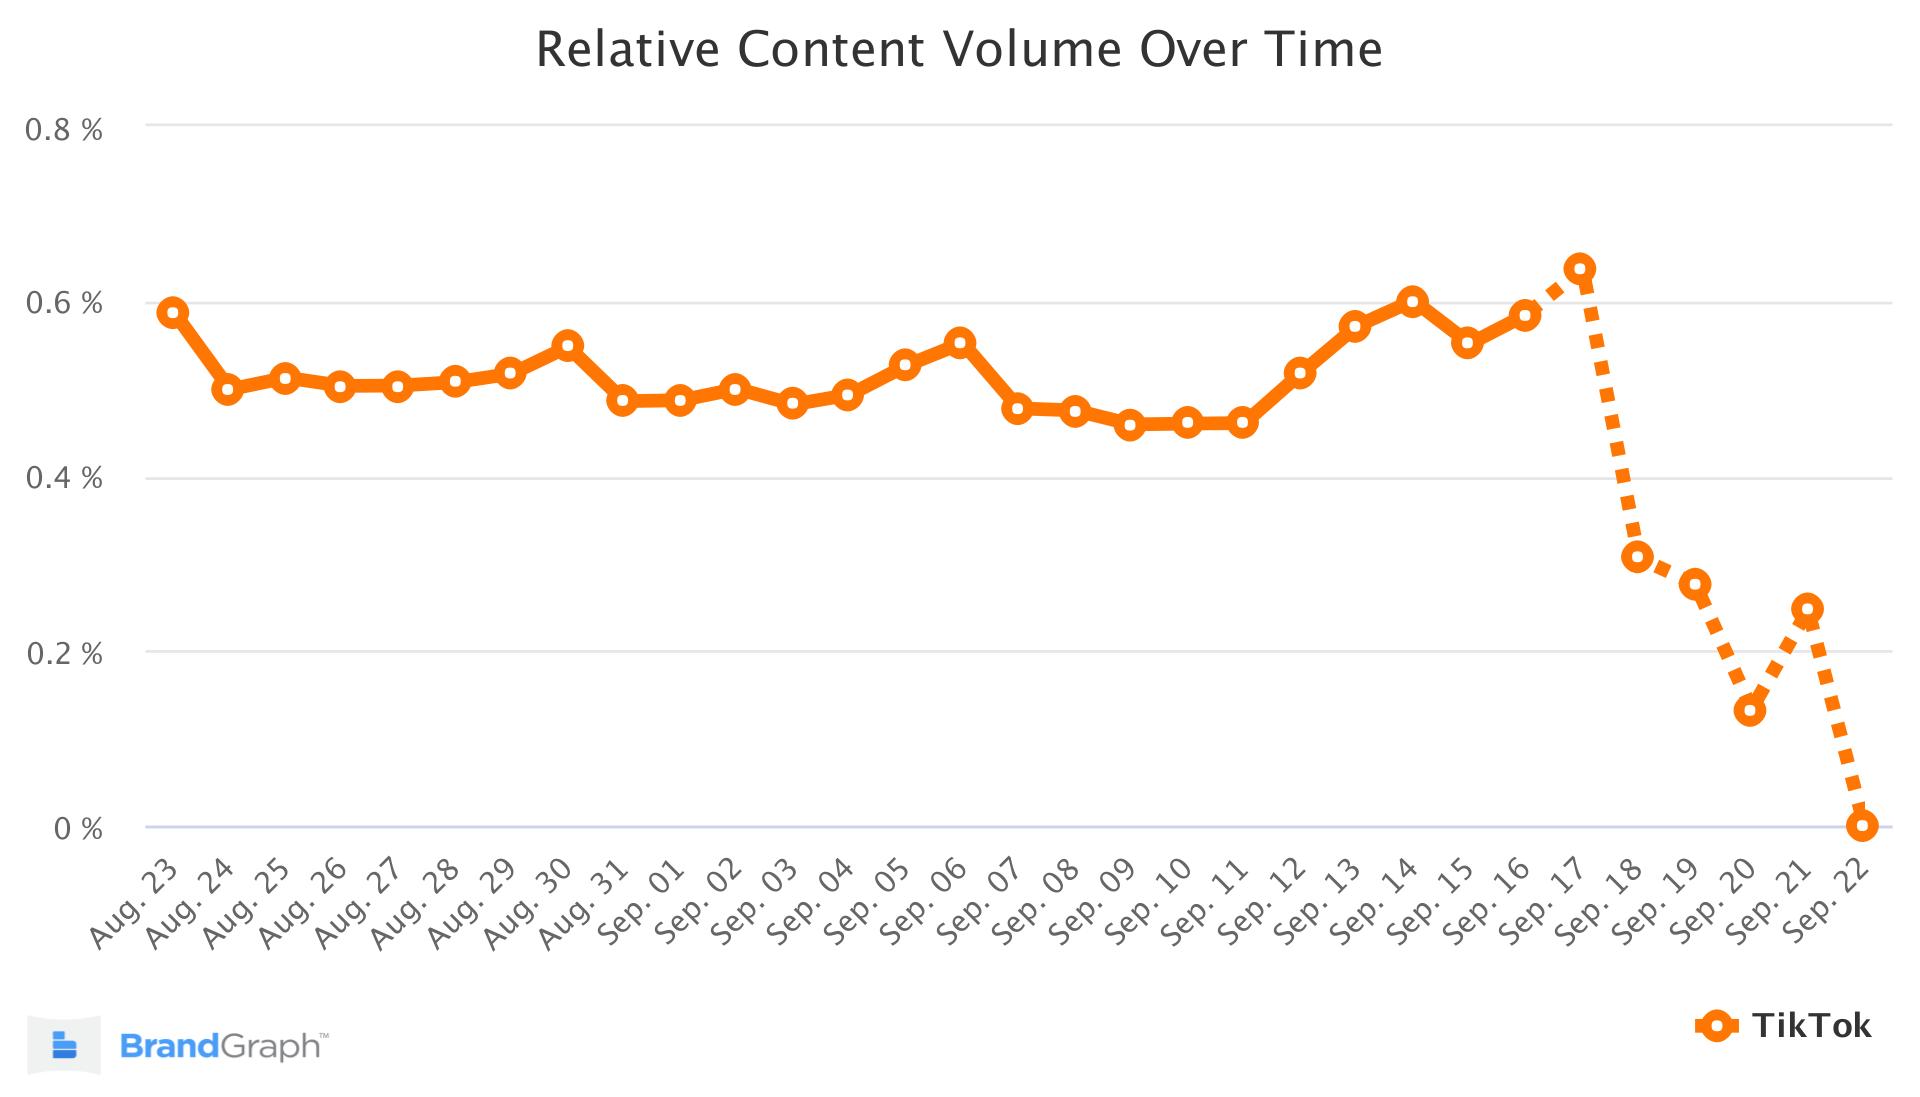 tiktok brandgraph trend chart